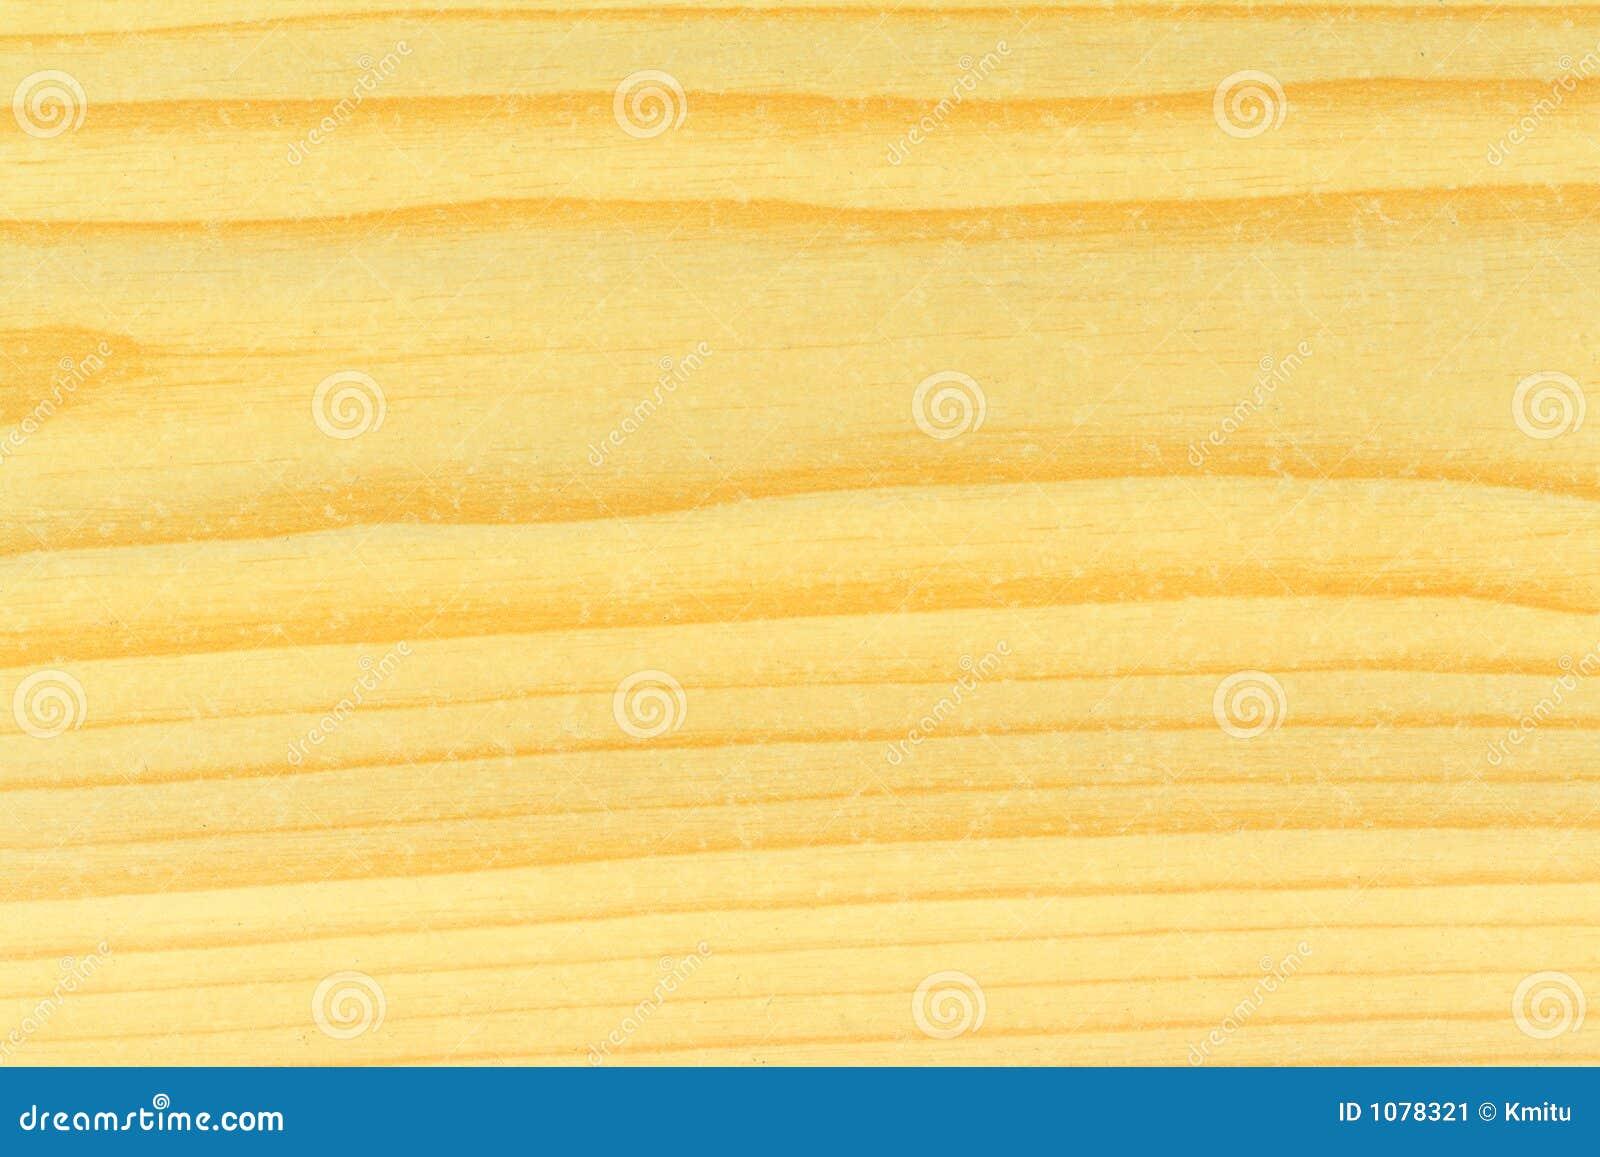 Textura brillante de madera de pino imagen de archivo imagen de puerta suelo 1078321 - Madera de pino ...